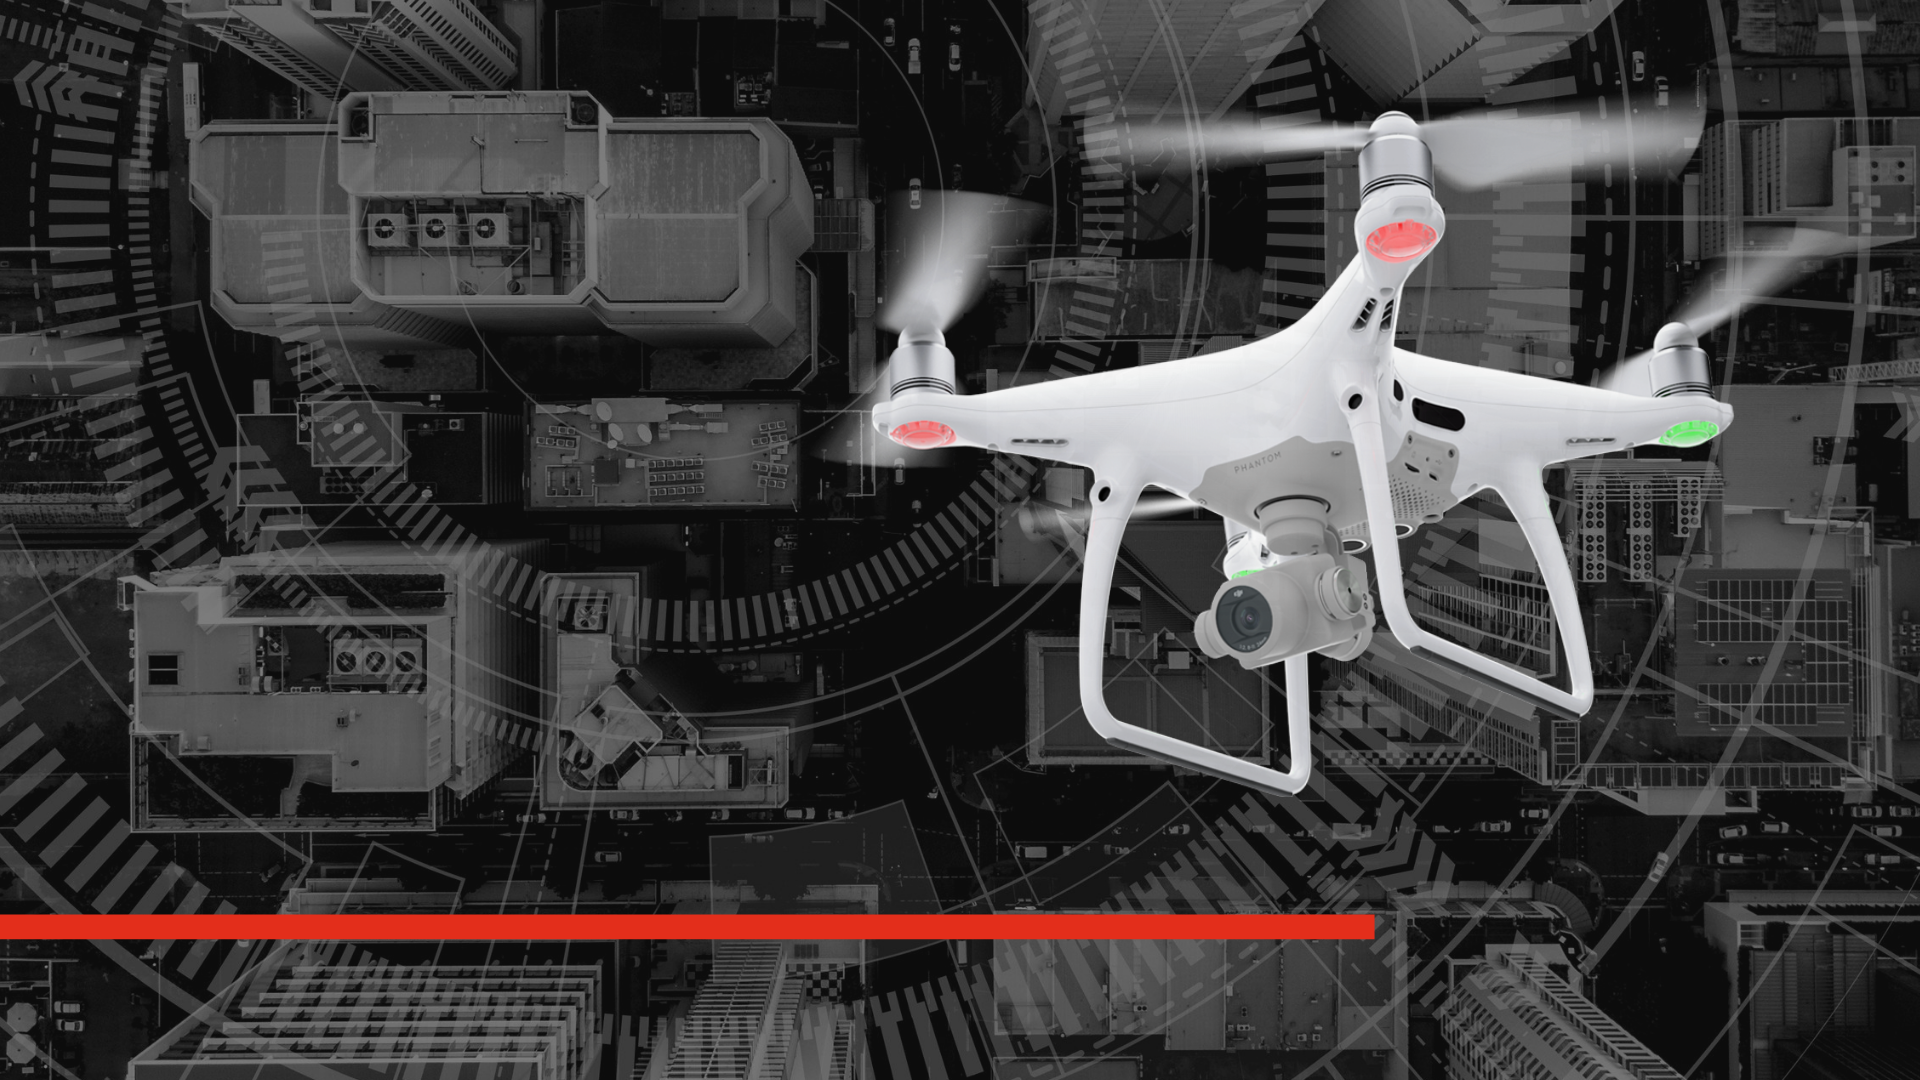 DJI Phantom 4 Pro Police and Fire Drone